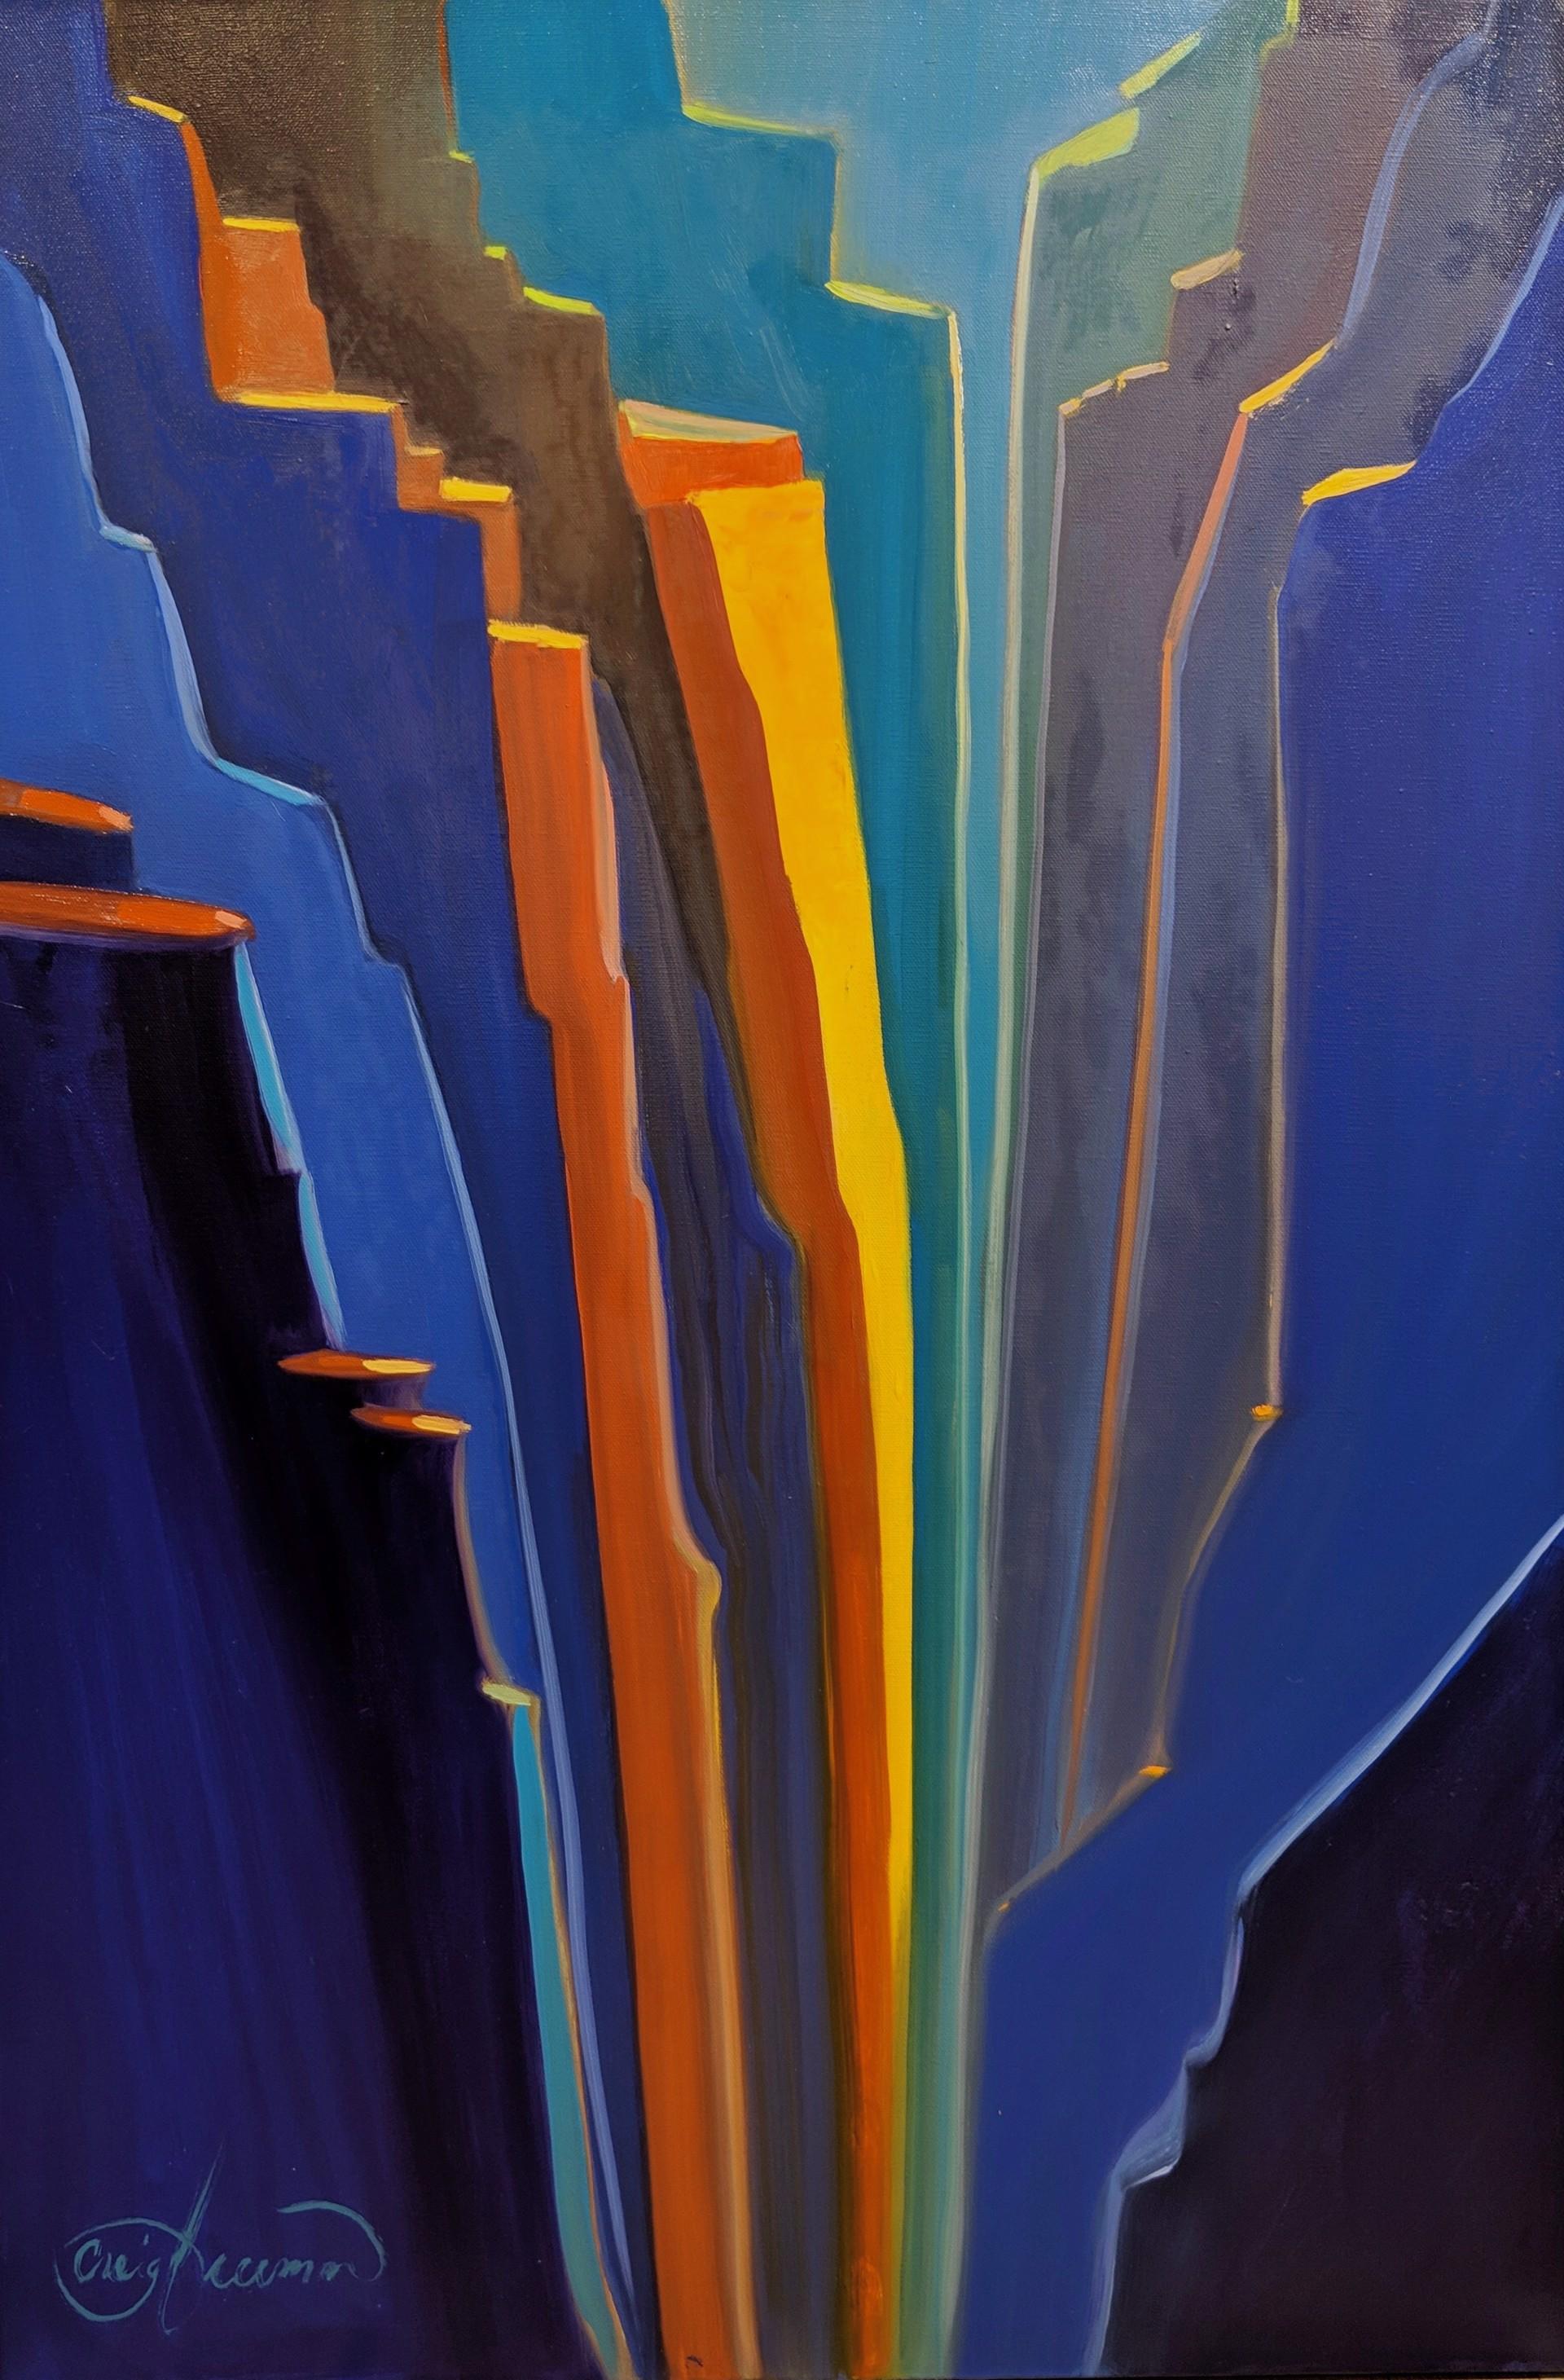 Ascending by Craig Freeman